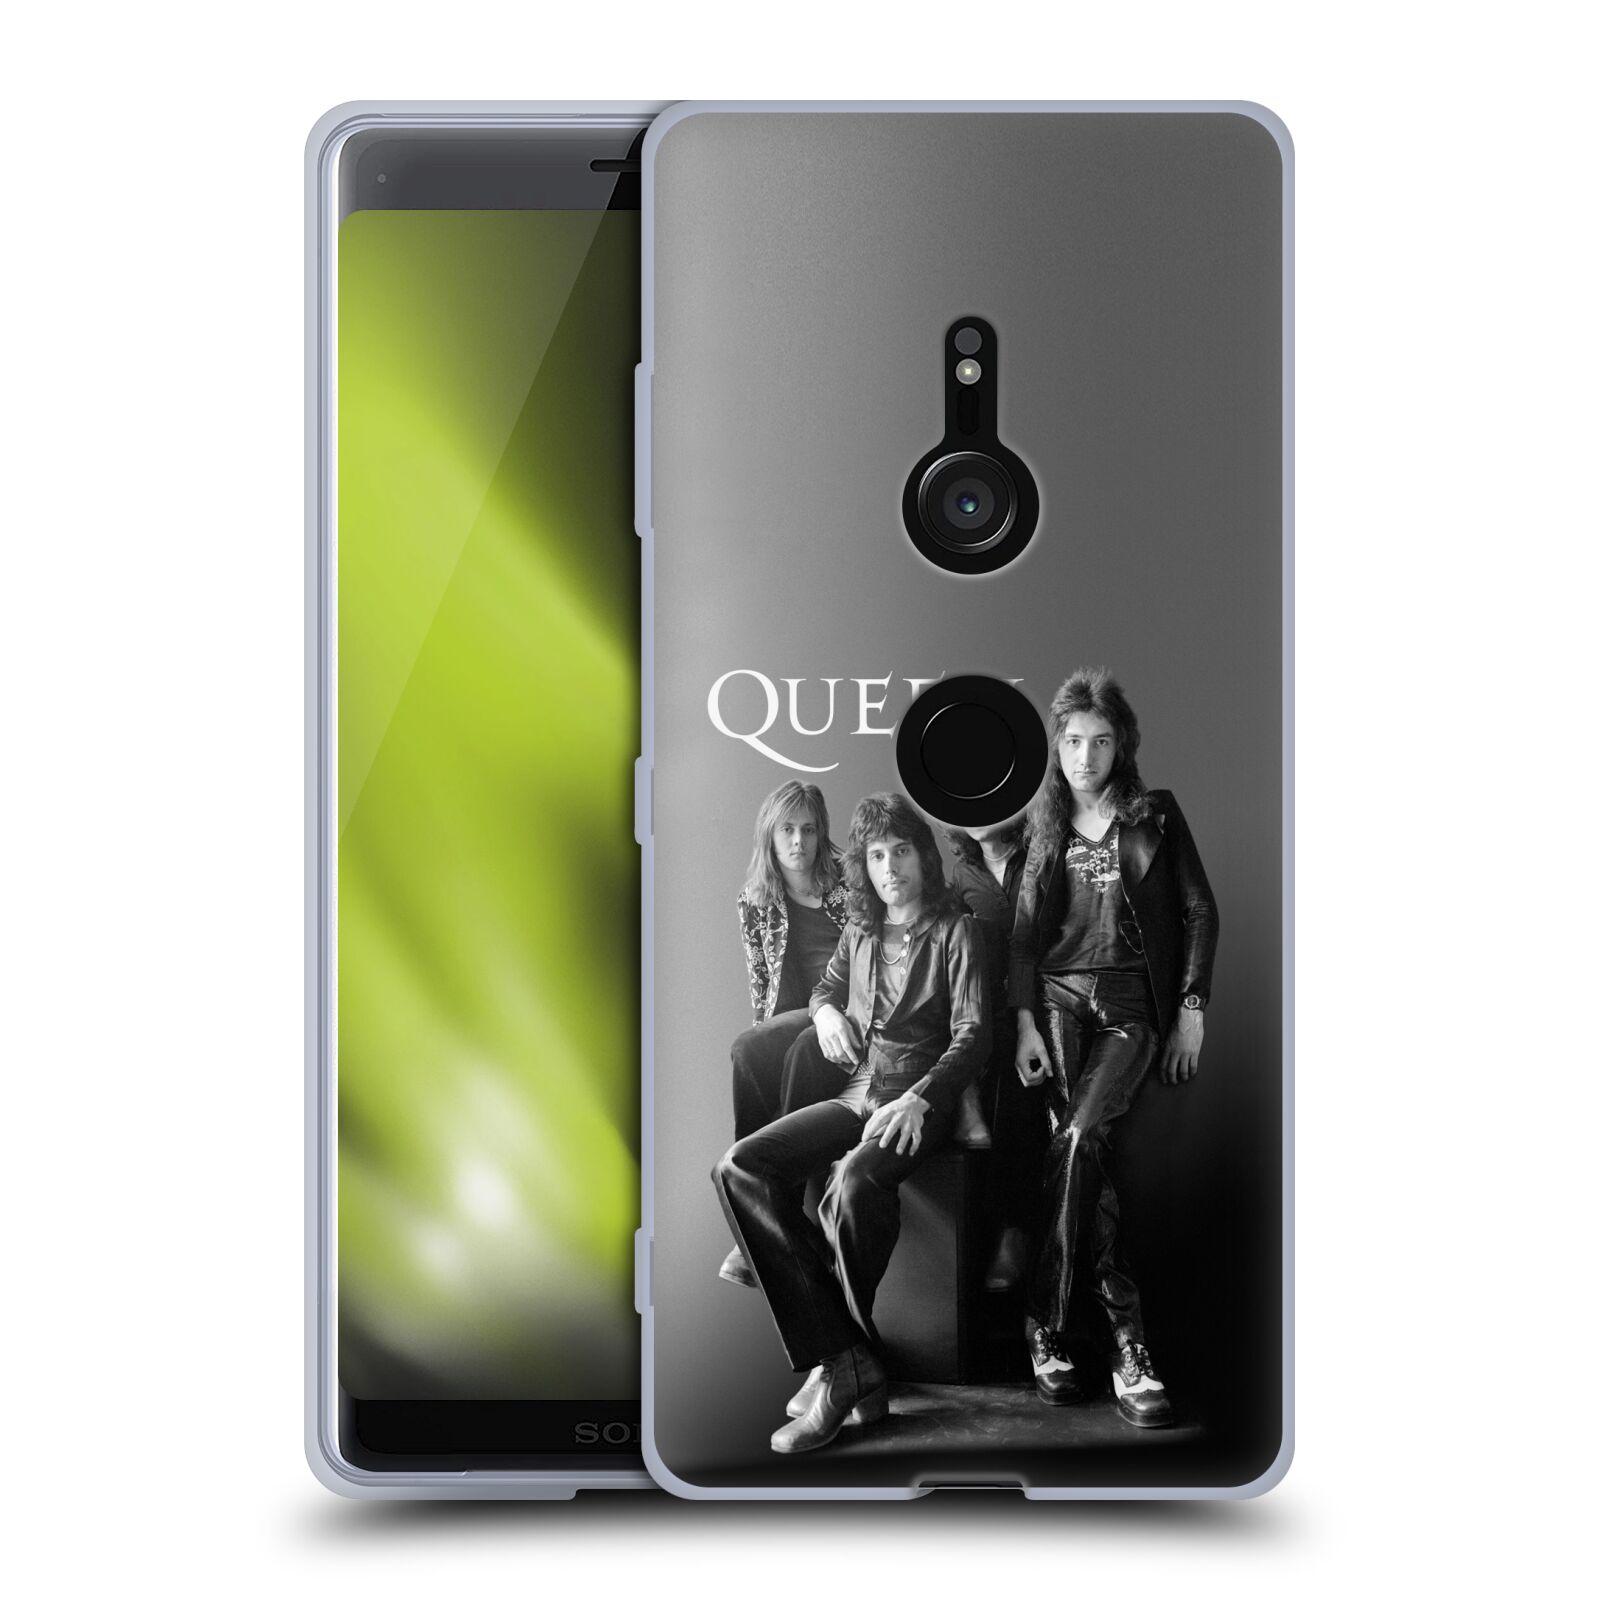 Silikonové pouzdro na mobil Sony Xperia XZ3 - Head Case - Queen - Skupina